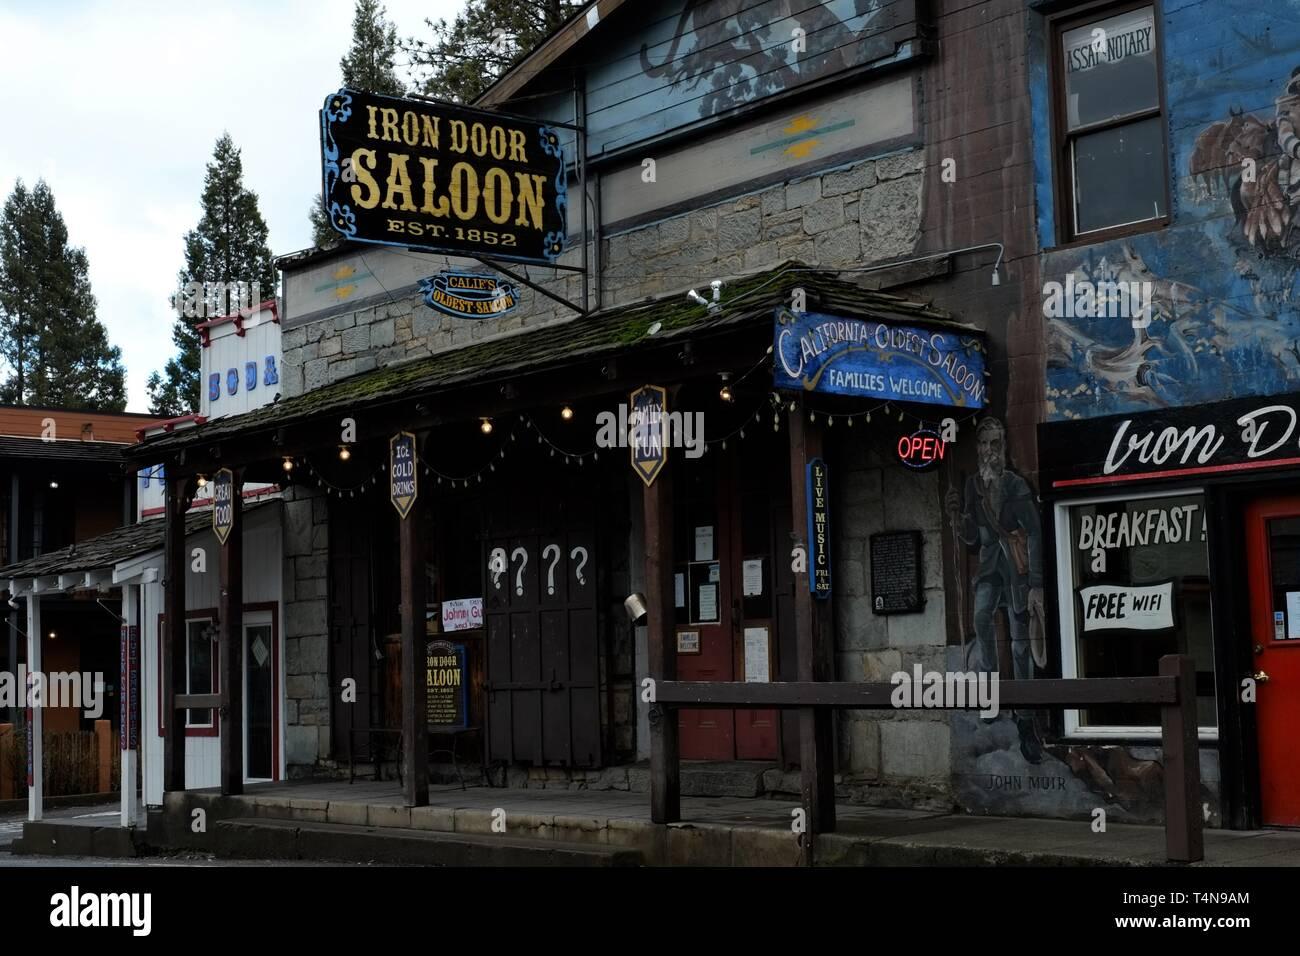 Iron Door Saloon - Stock Image